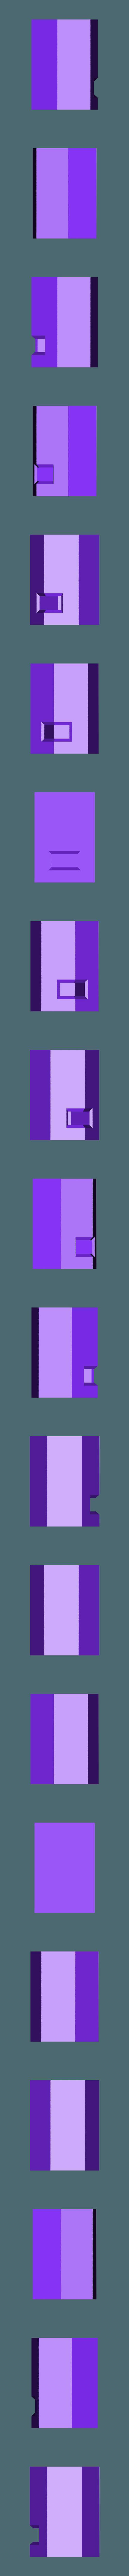 CamRiser.stl Télécharger fichier STL gratuit Support universel de caméra Ender 3 Bed • Objet à imprimer en 3D, Kliffom